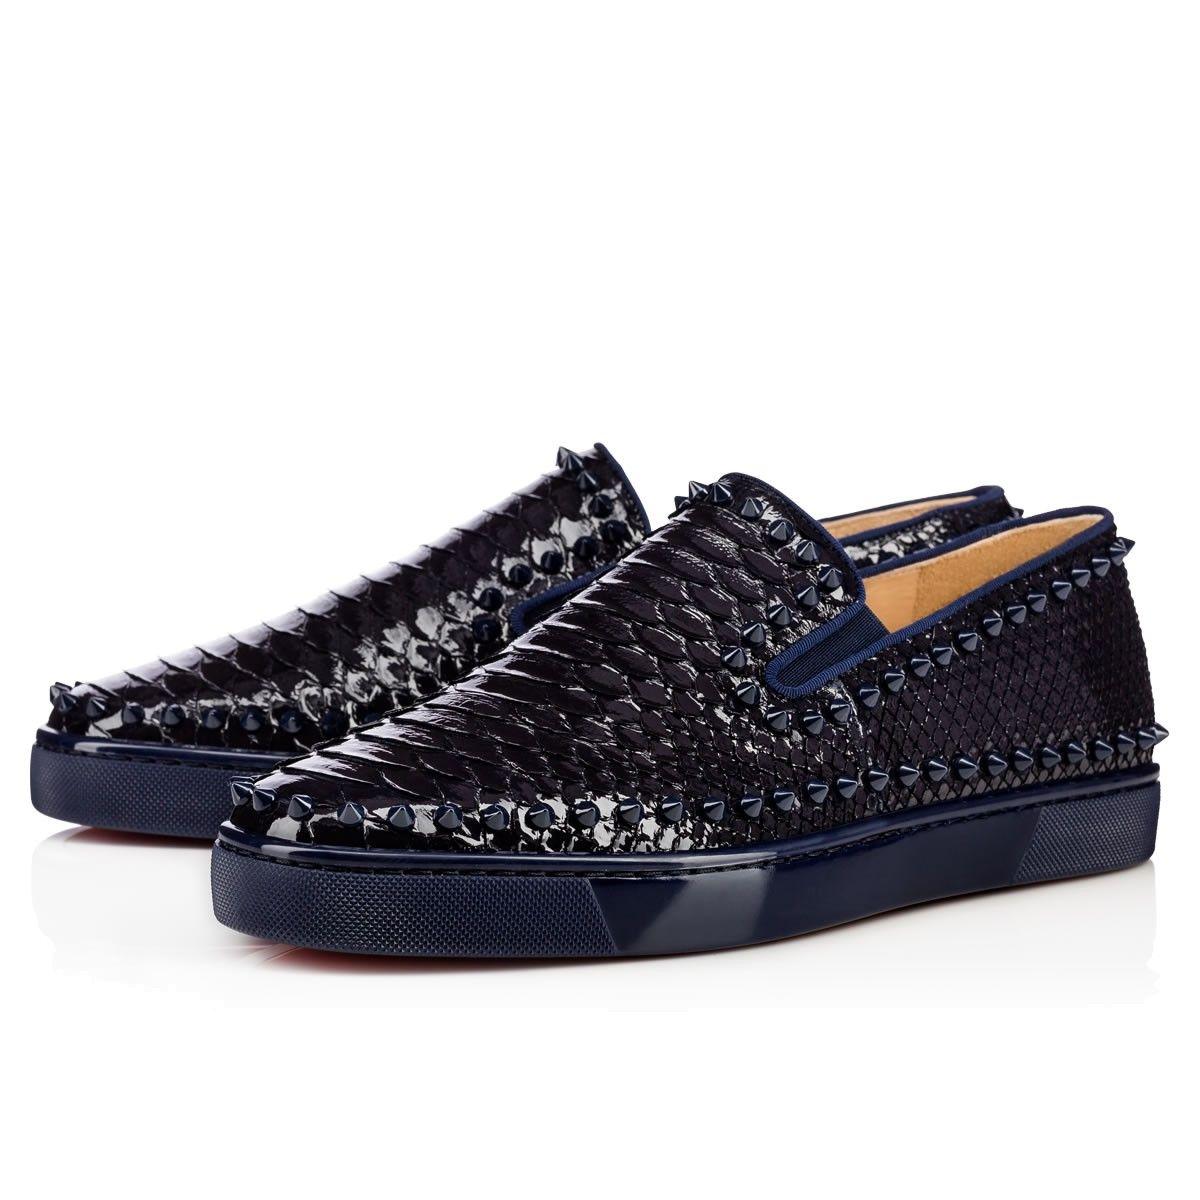 Christian Louboutin Zapato de barco Niño